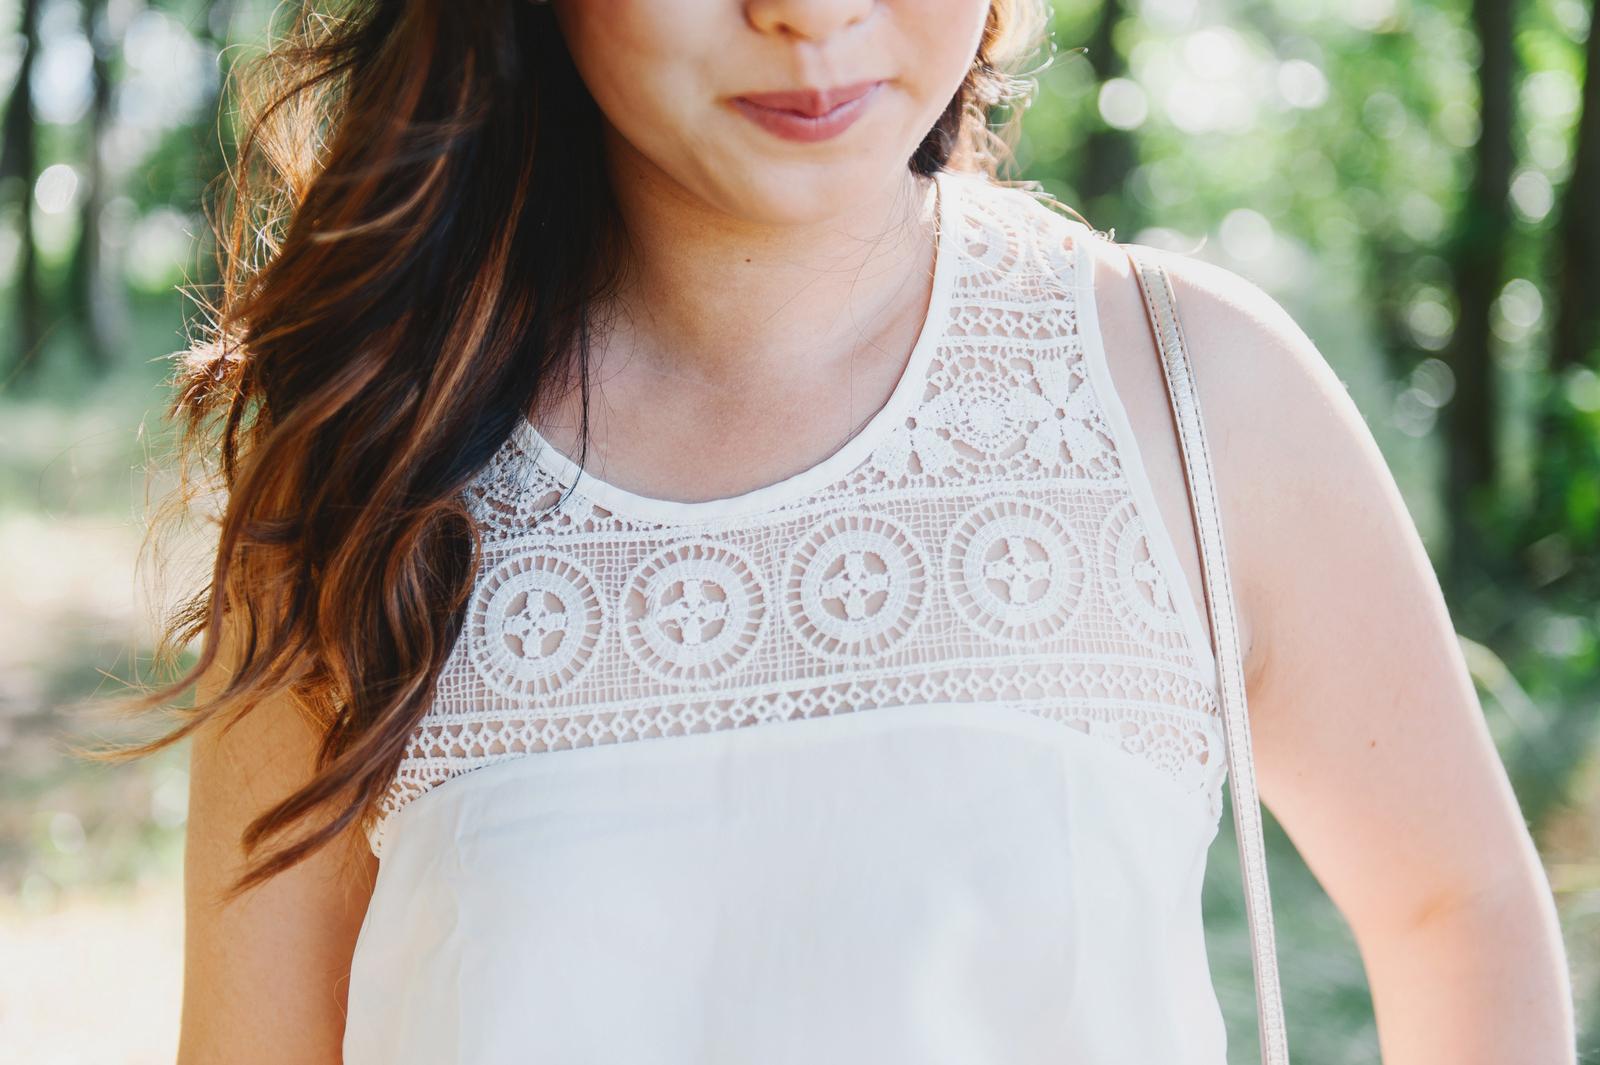 Sandy a la Mode | Fashion Blogger wearing RubyClaire Boutique